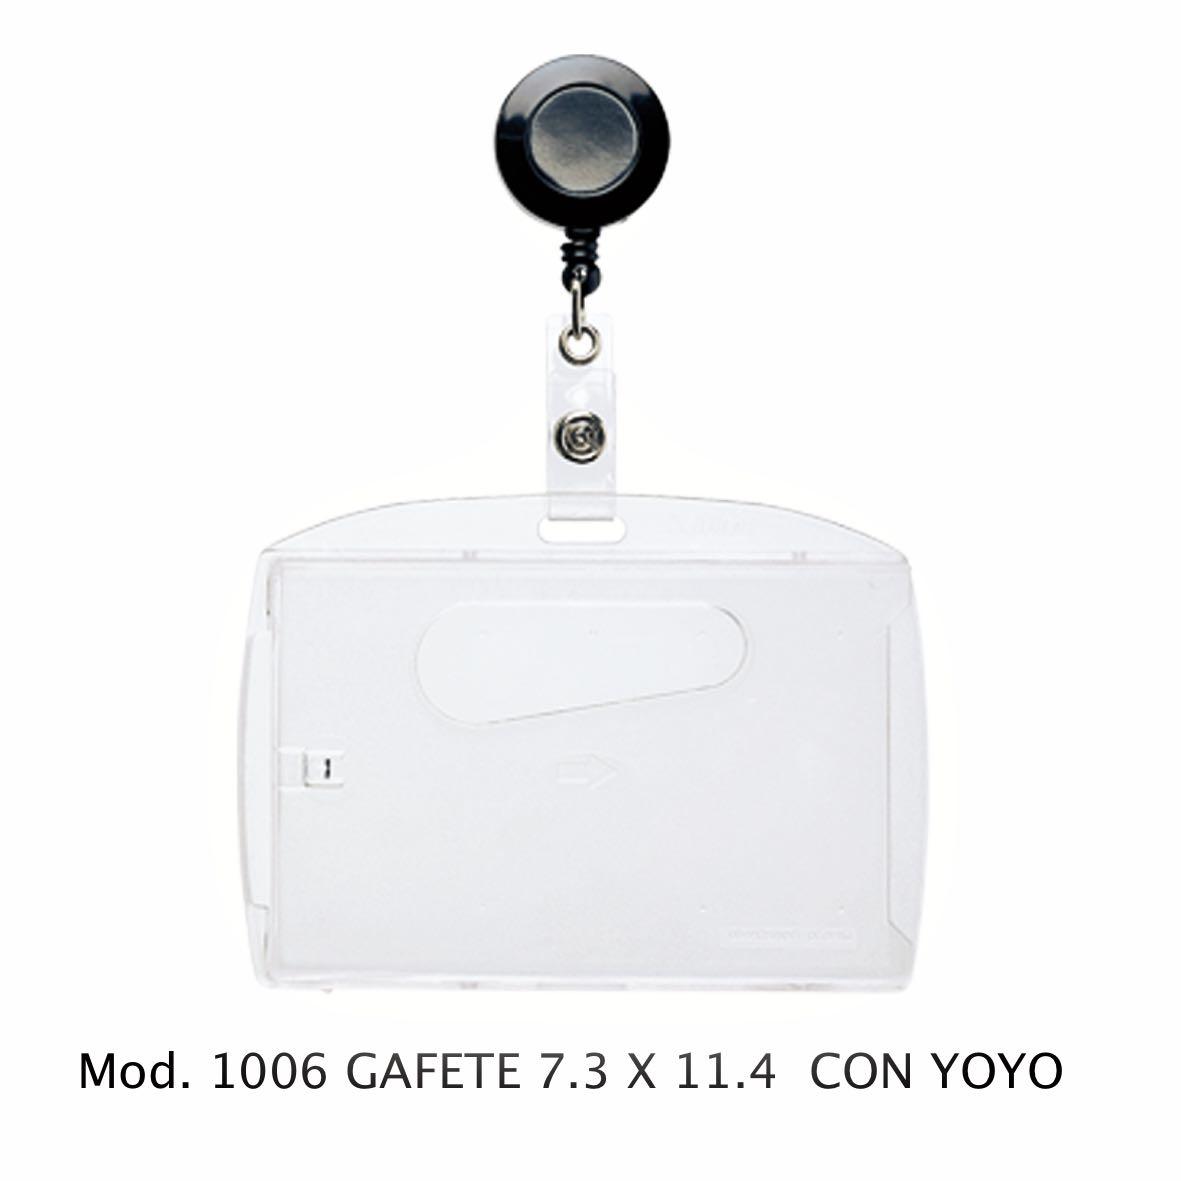 Gafete con yoyo grande Modelo 1006 - Sablón